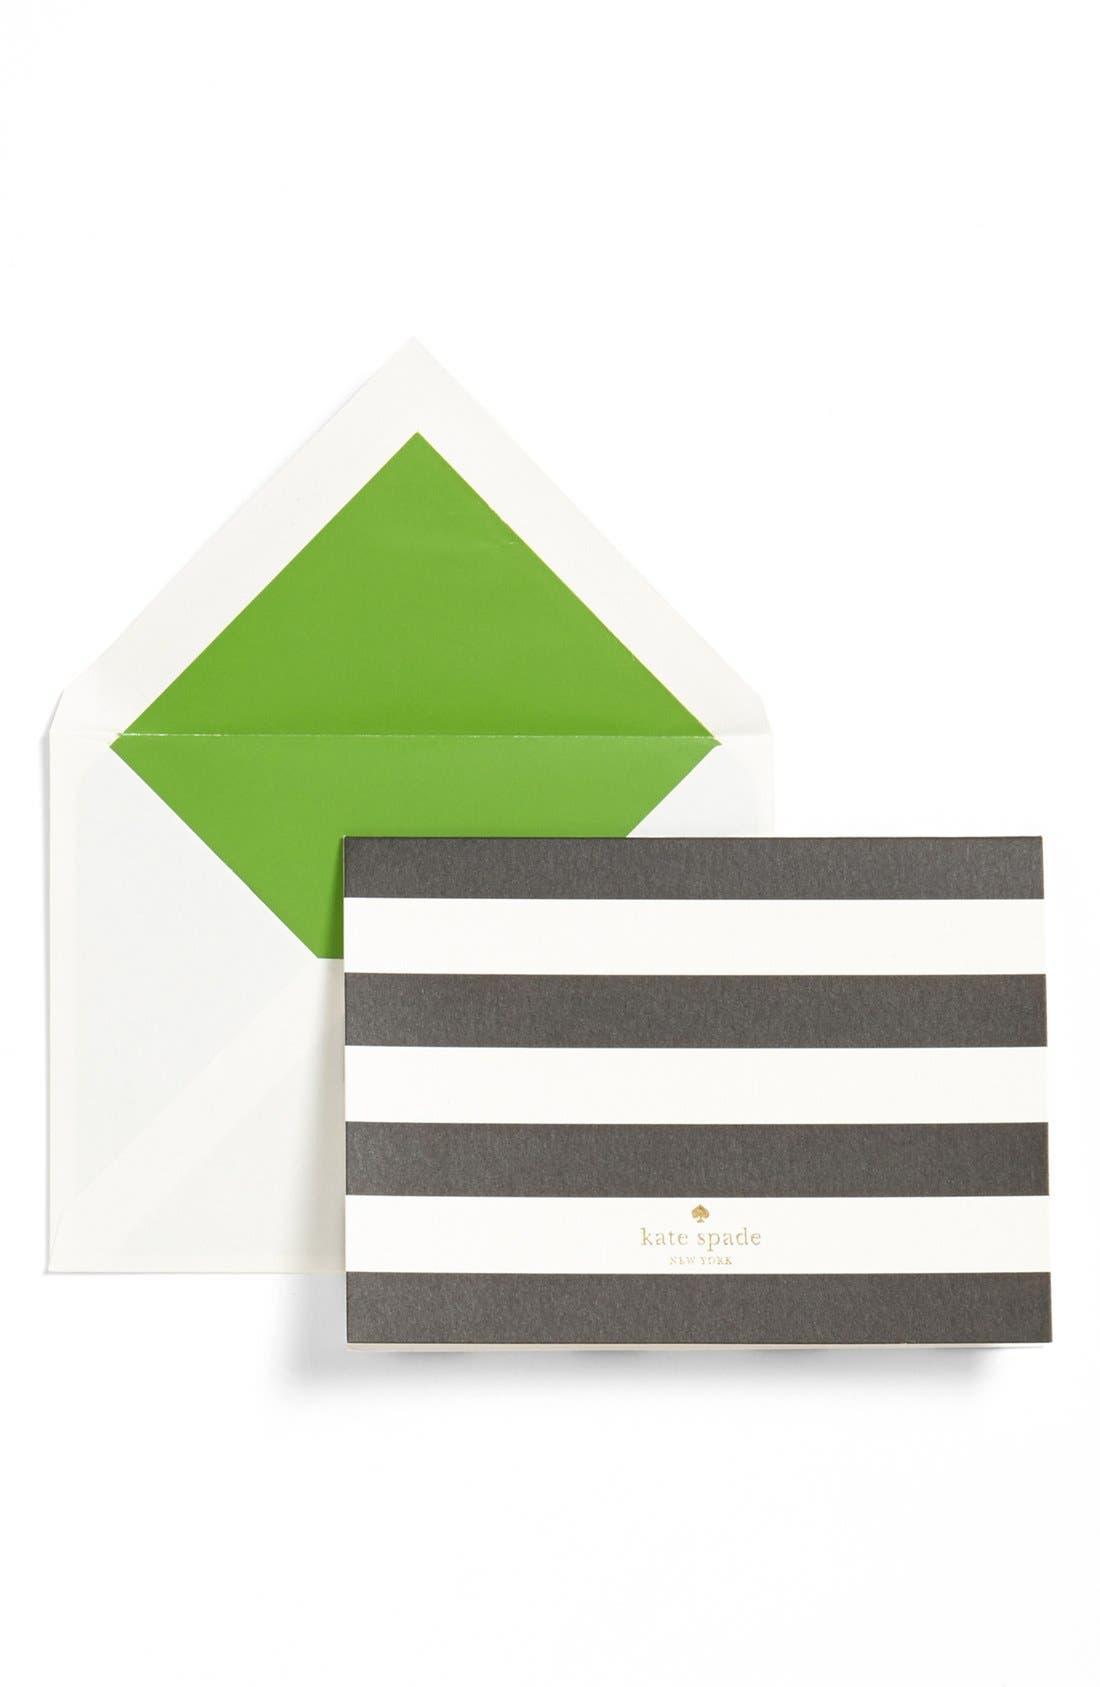 Alternate Image 1 Selected - kate spade new york 'polka dot' note cards (Set of 10)